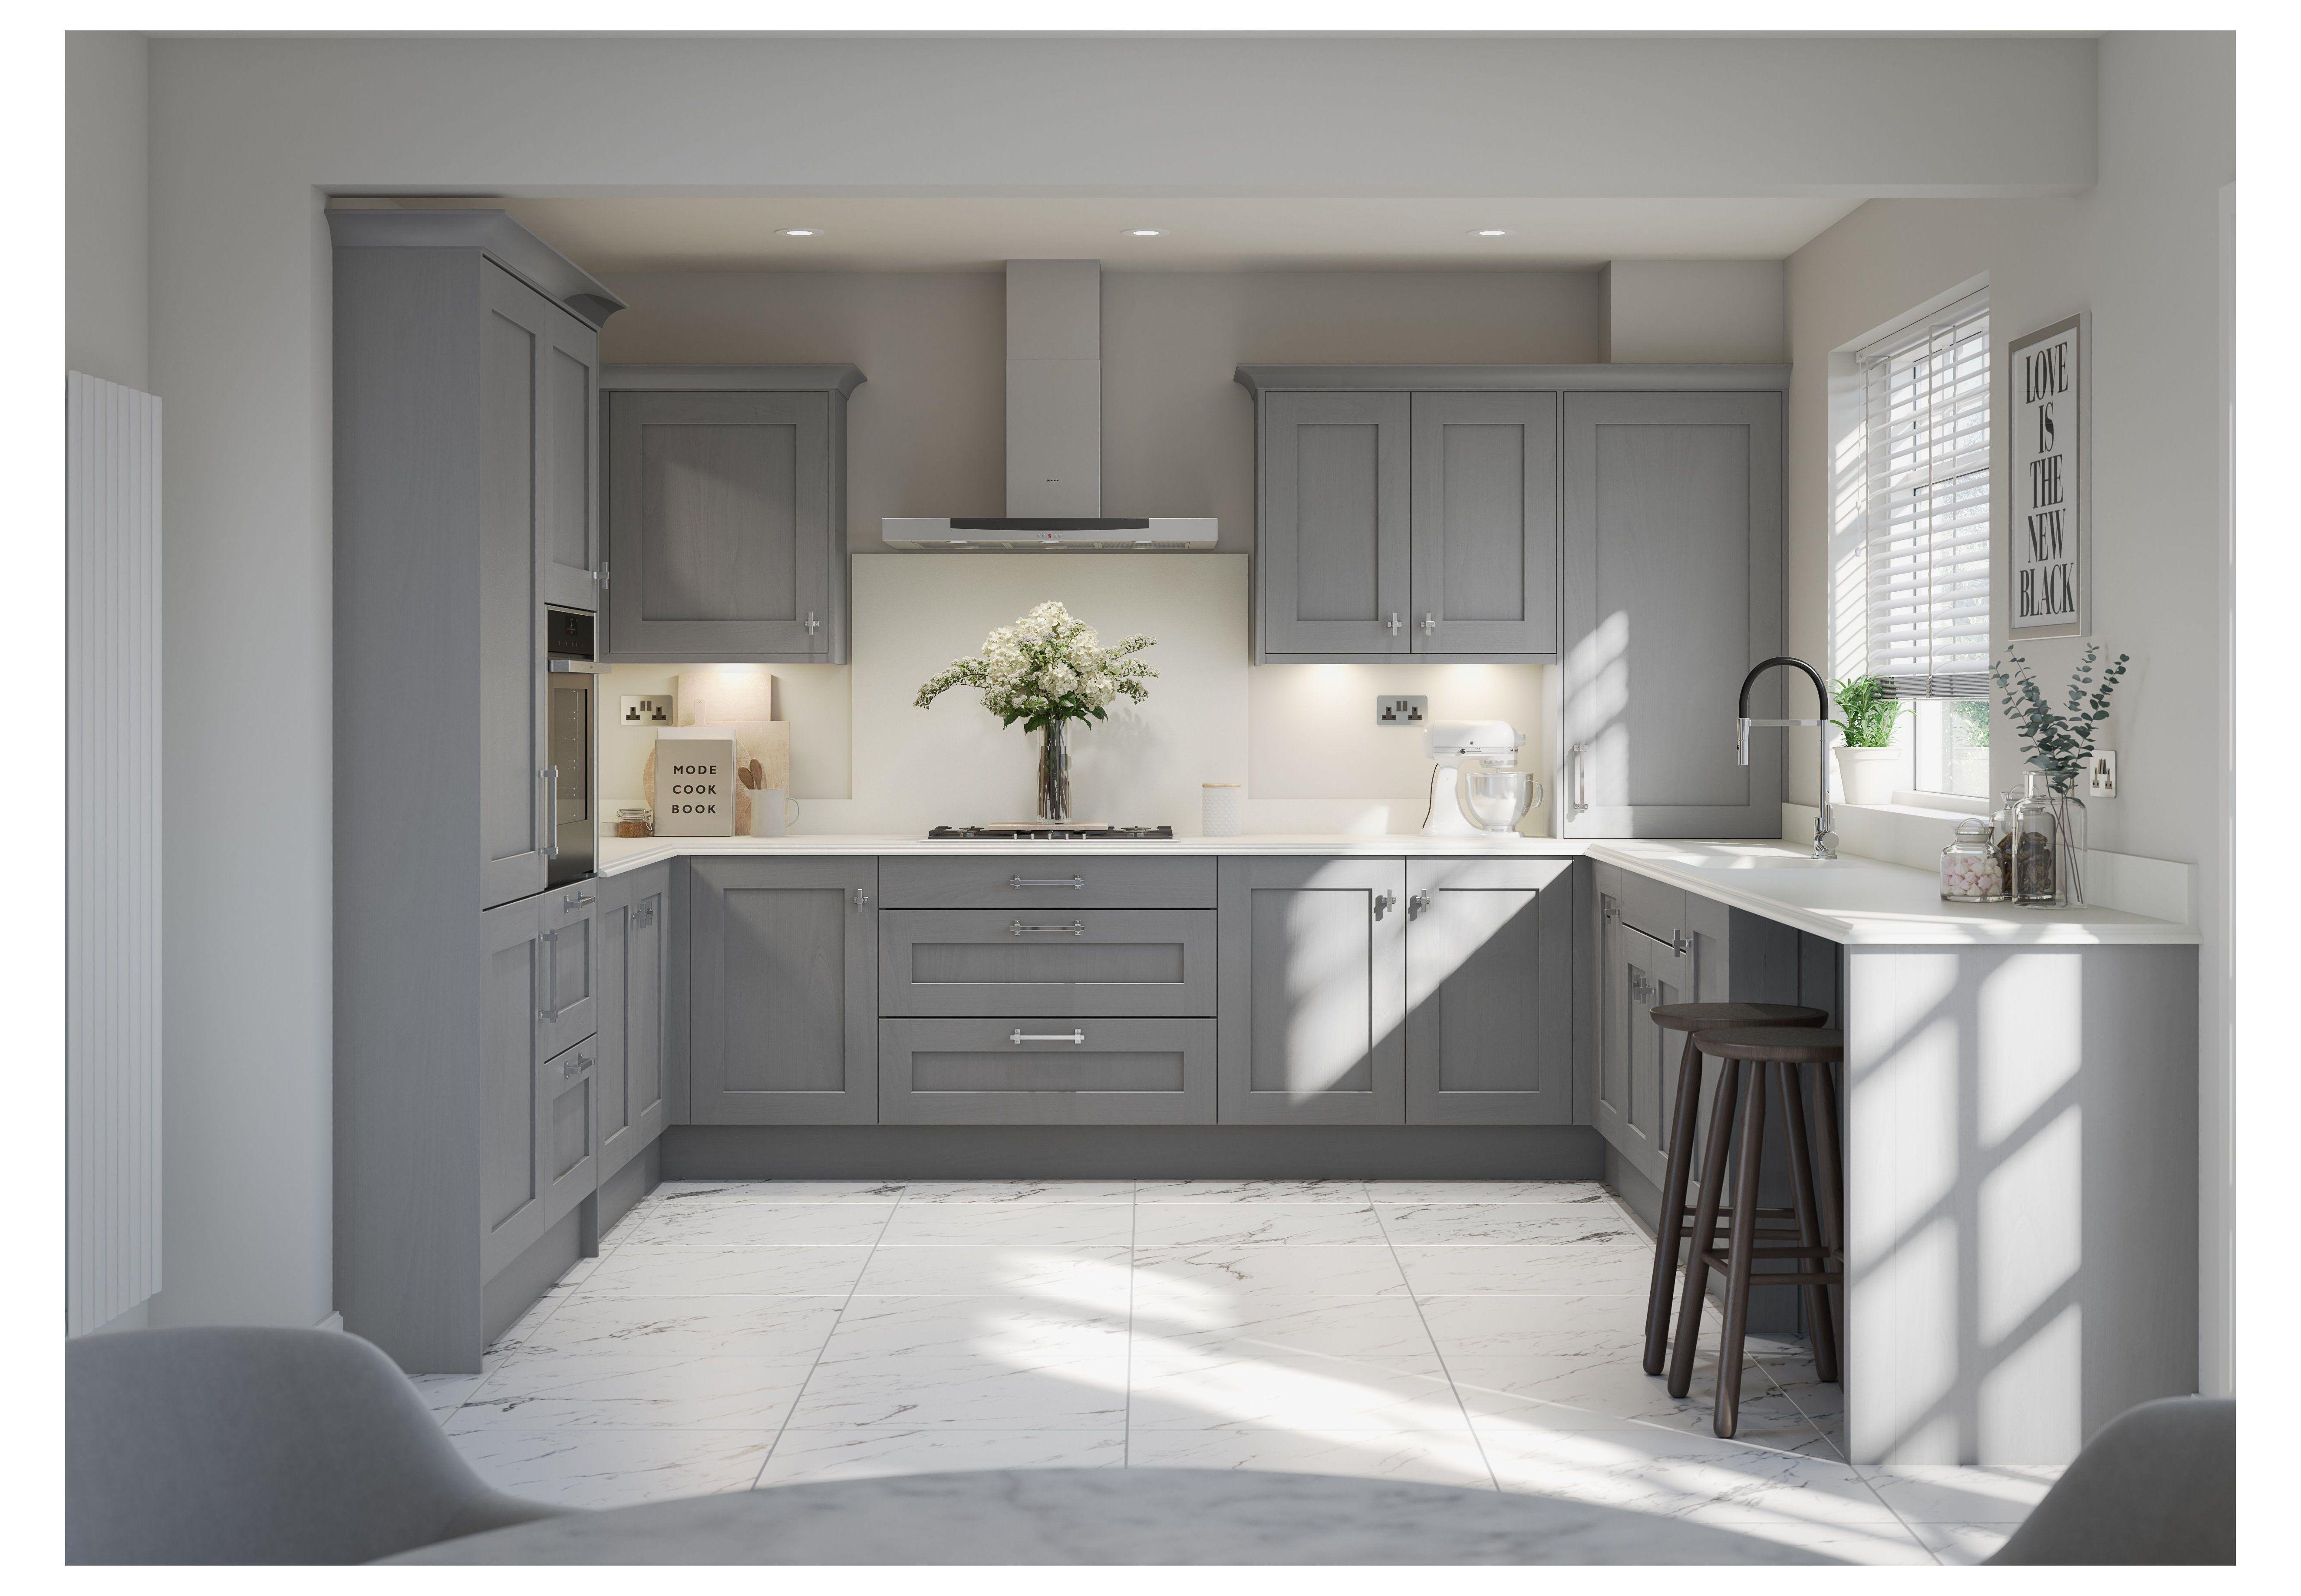 Second Nature's Mornington Shaker kitchen in Dust Grey kitchen ...